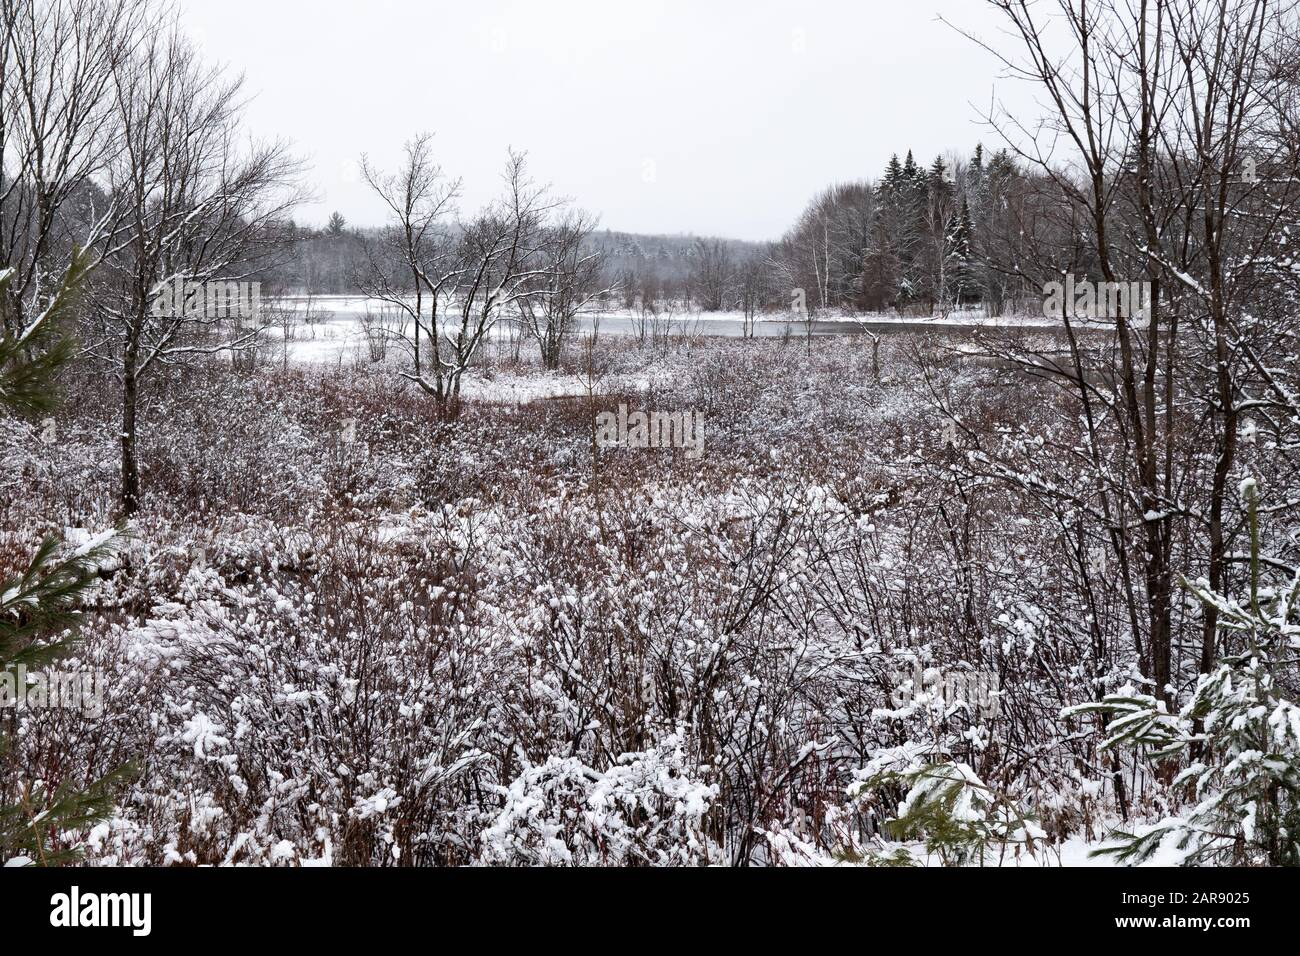 A snowy winter scene of the Sacandaga River near Speculator, NY USA in the Adirondack Mountains. Stock Photo